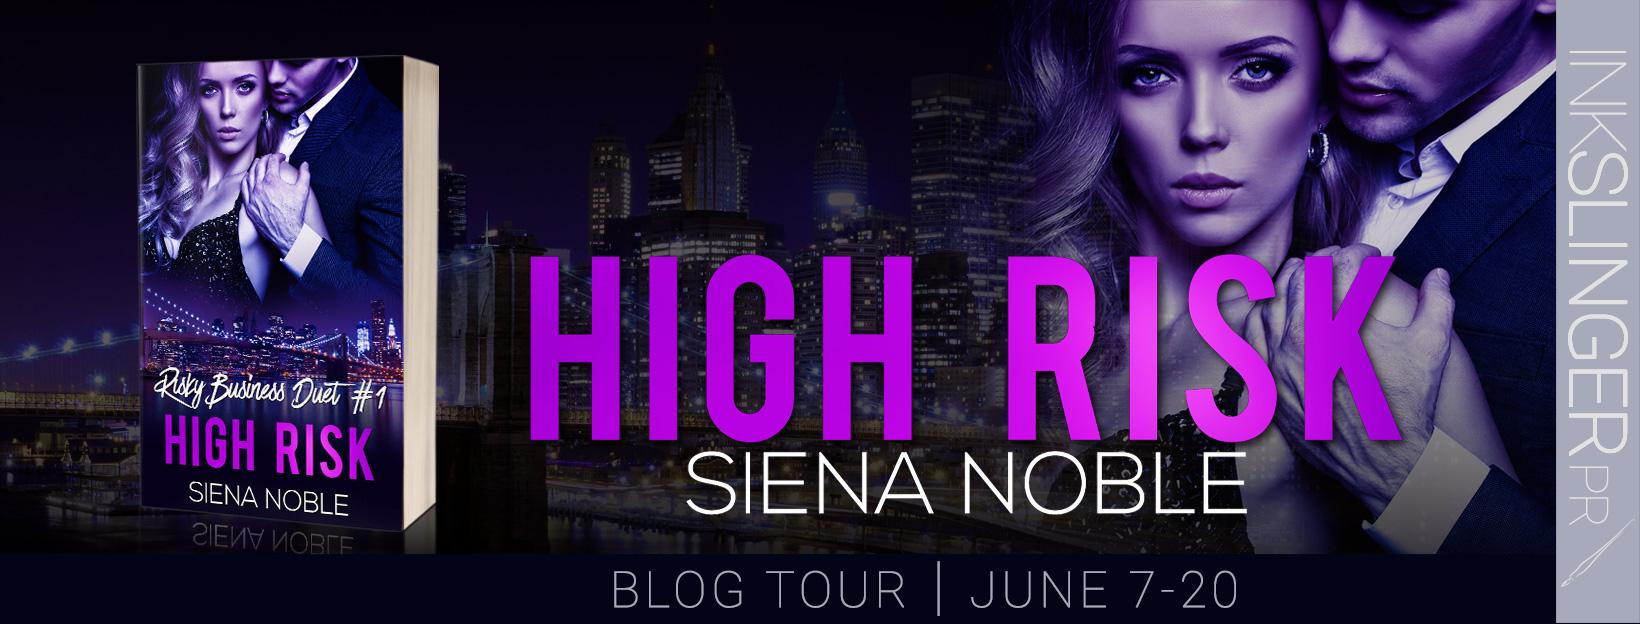 HighRisk(1)_blogtour.jpg